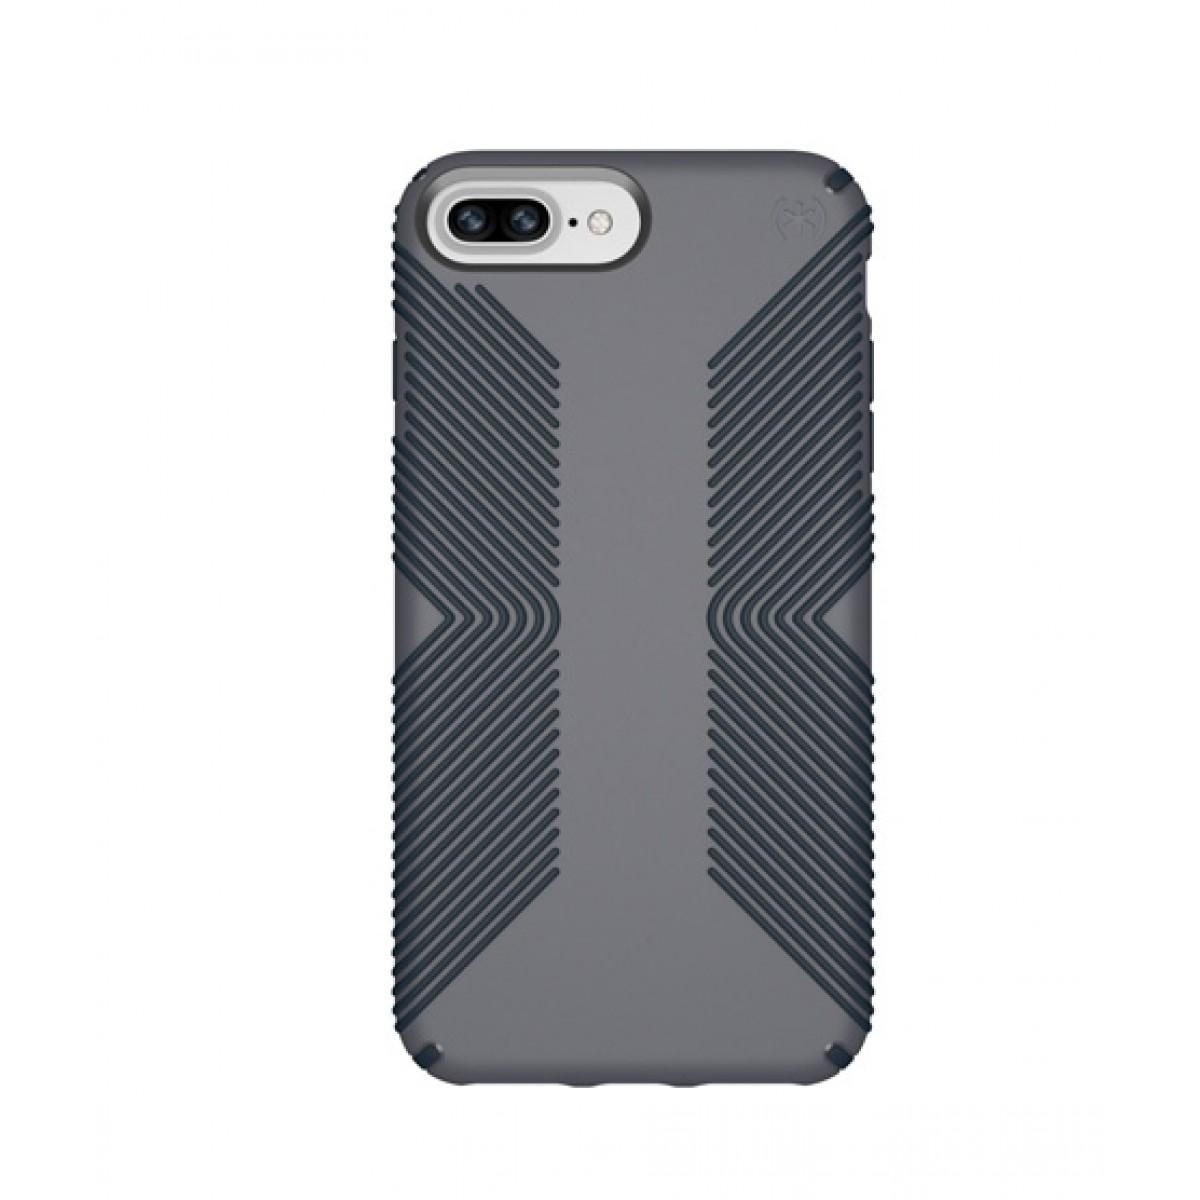 promo code 22231 58fa1 Speck Presidio Grip Graphite Grey/Charcoal Grey Case For iPhone 8 Plus